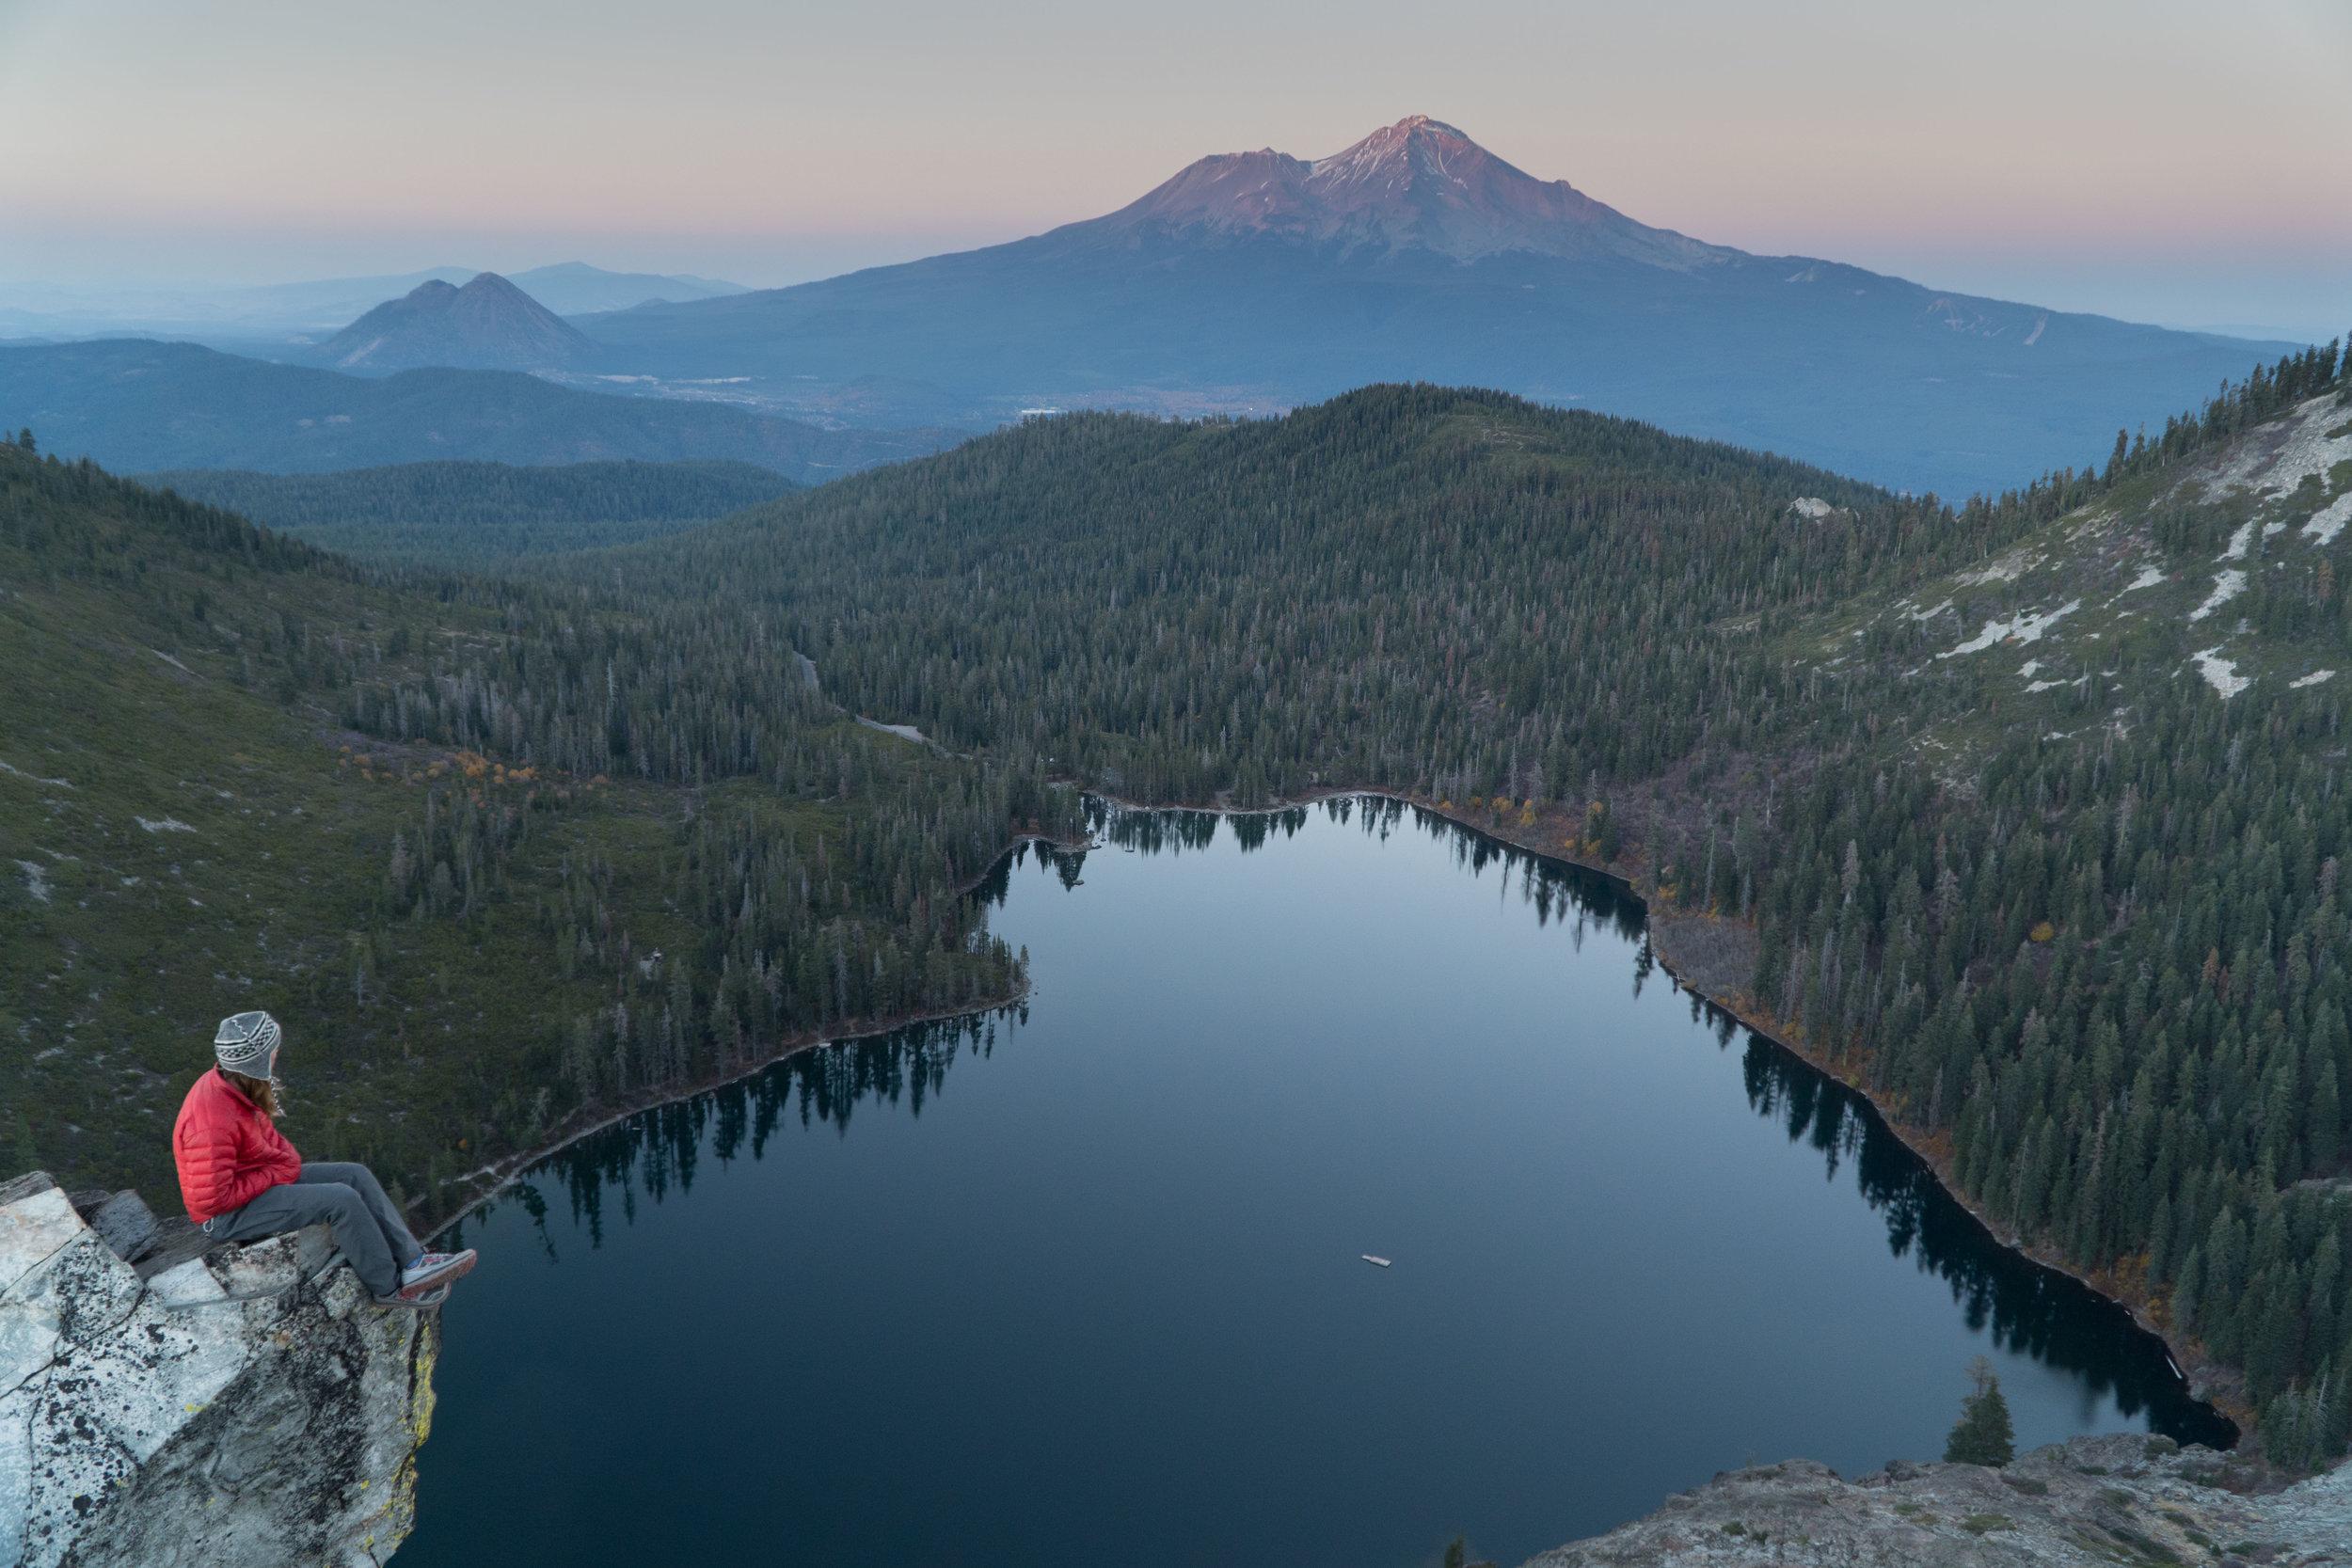 Mt Shasta Hiking Free Camping (4 of 7).jpg